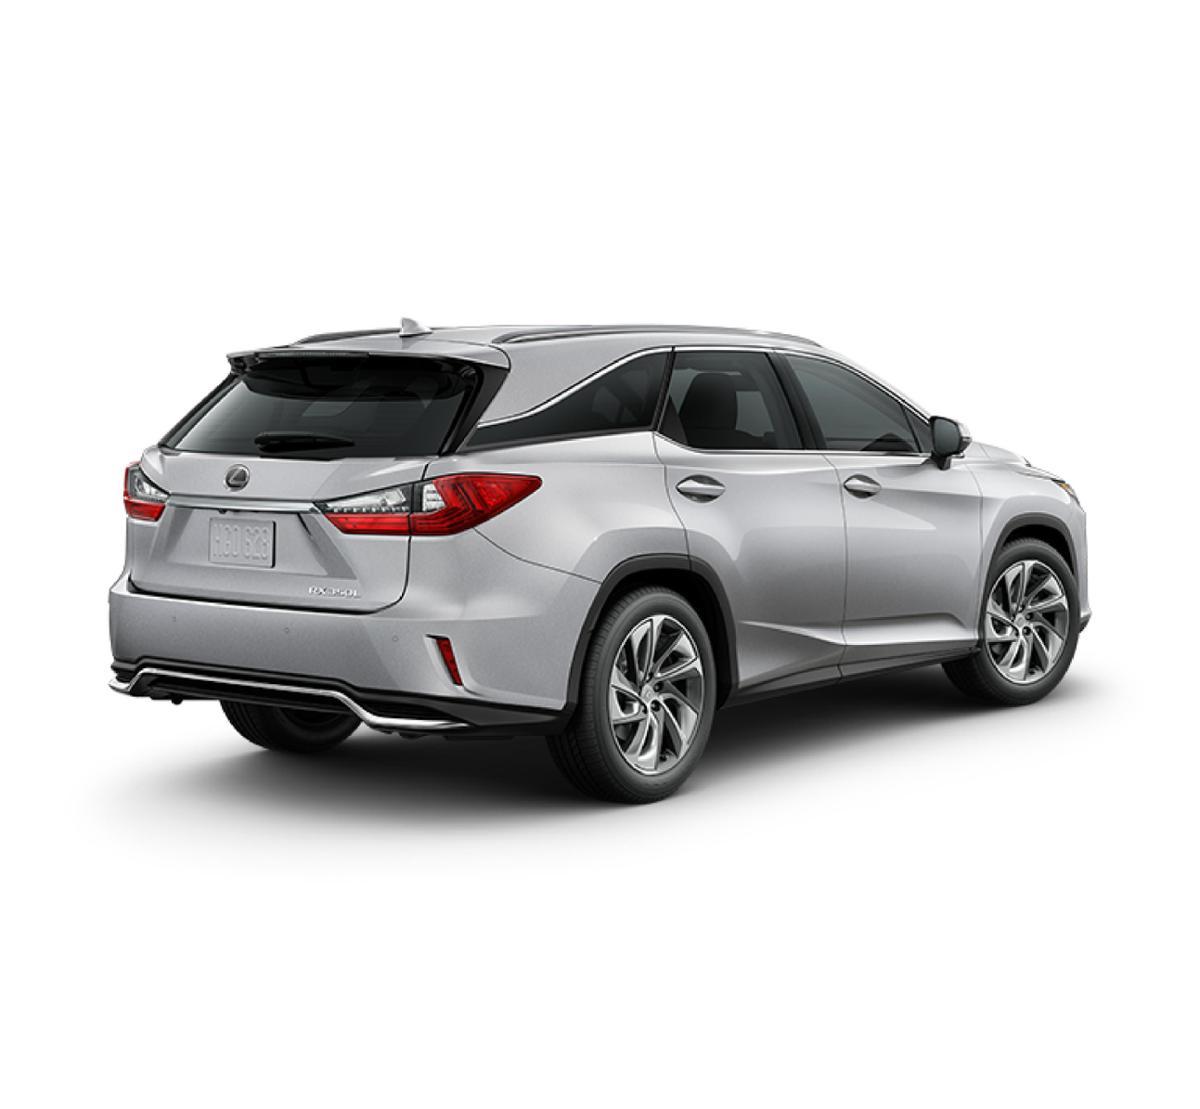 Silver Lining Metallic 2019 Lexus RX 350L: New Suv For